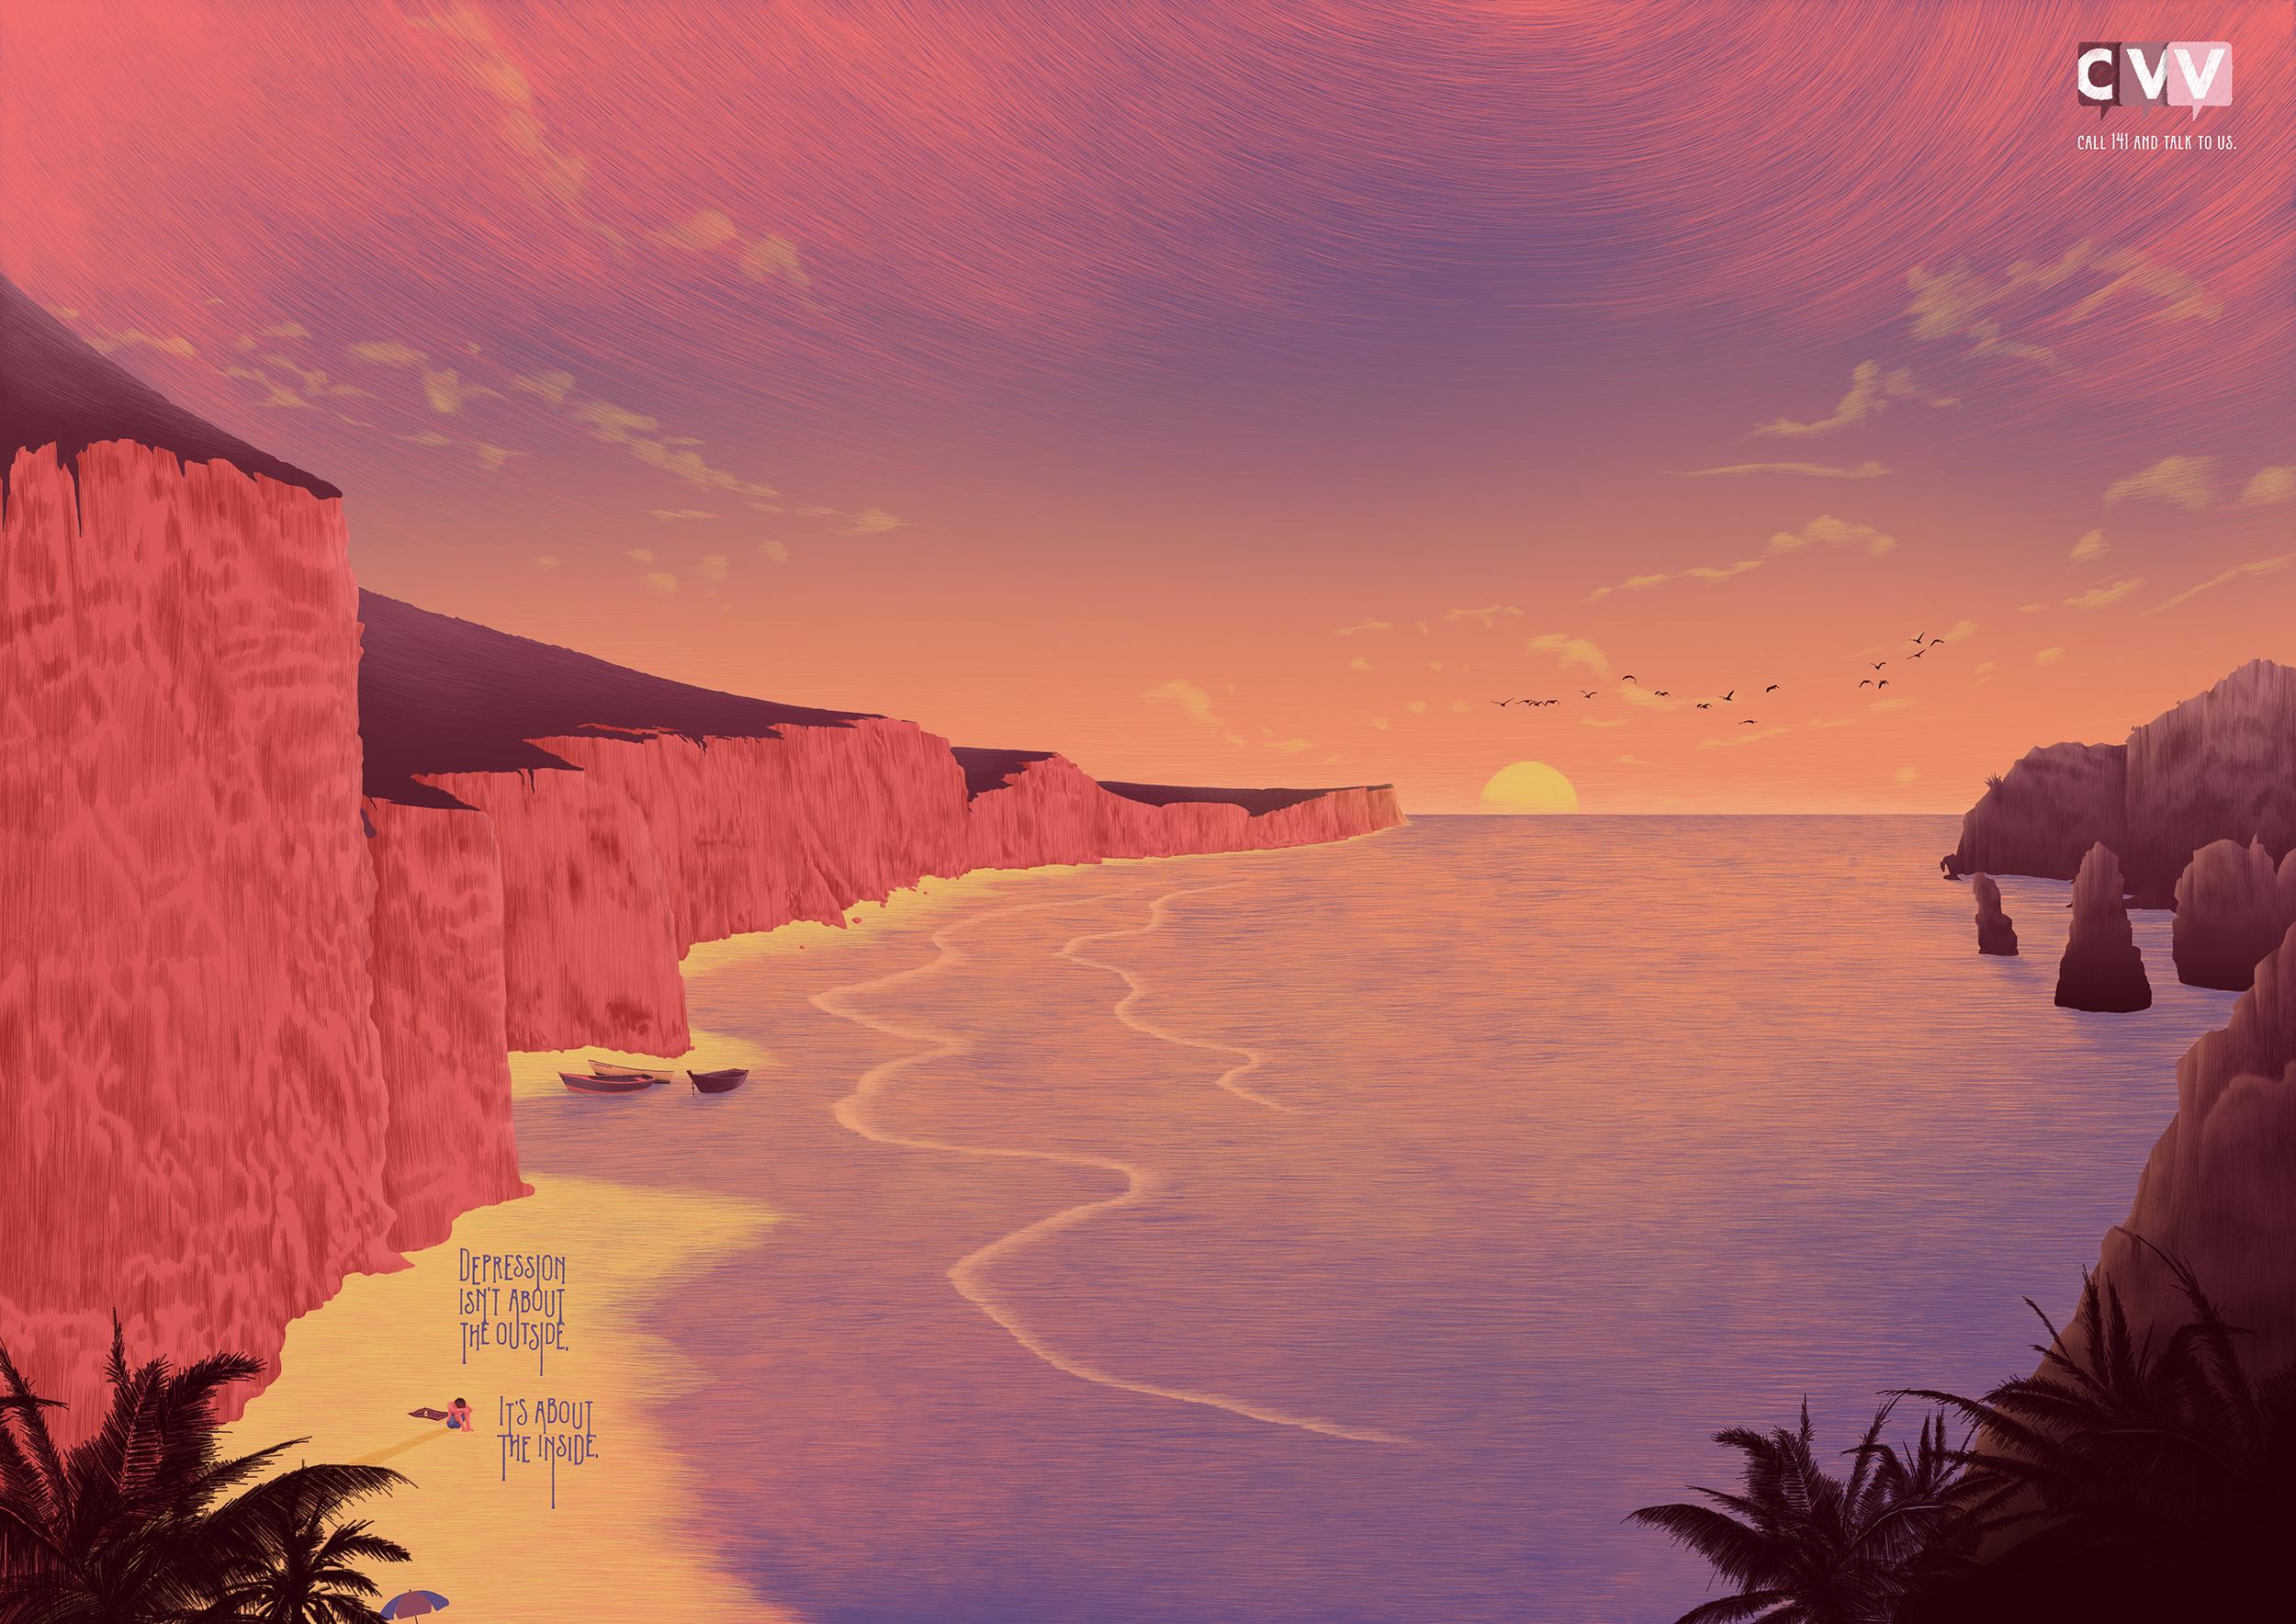 CVV_Landscape_02_Archive.jpg